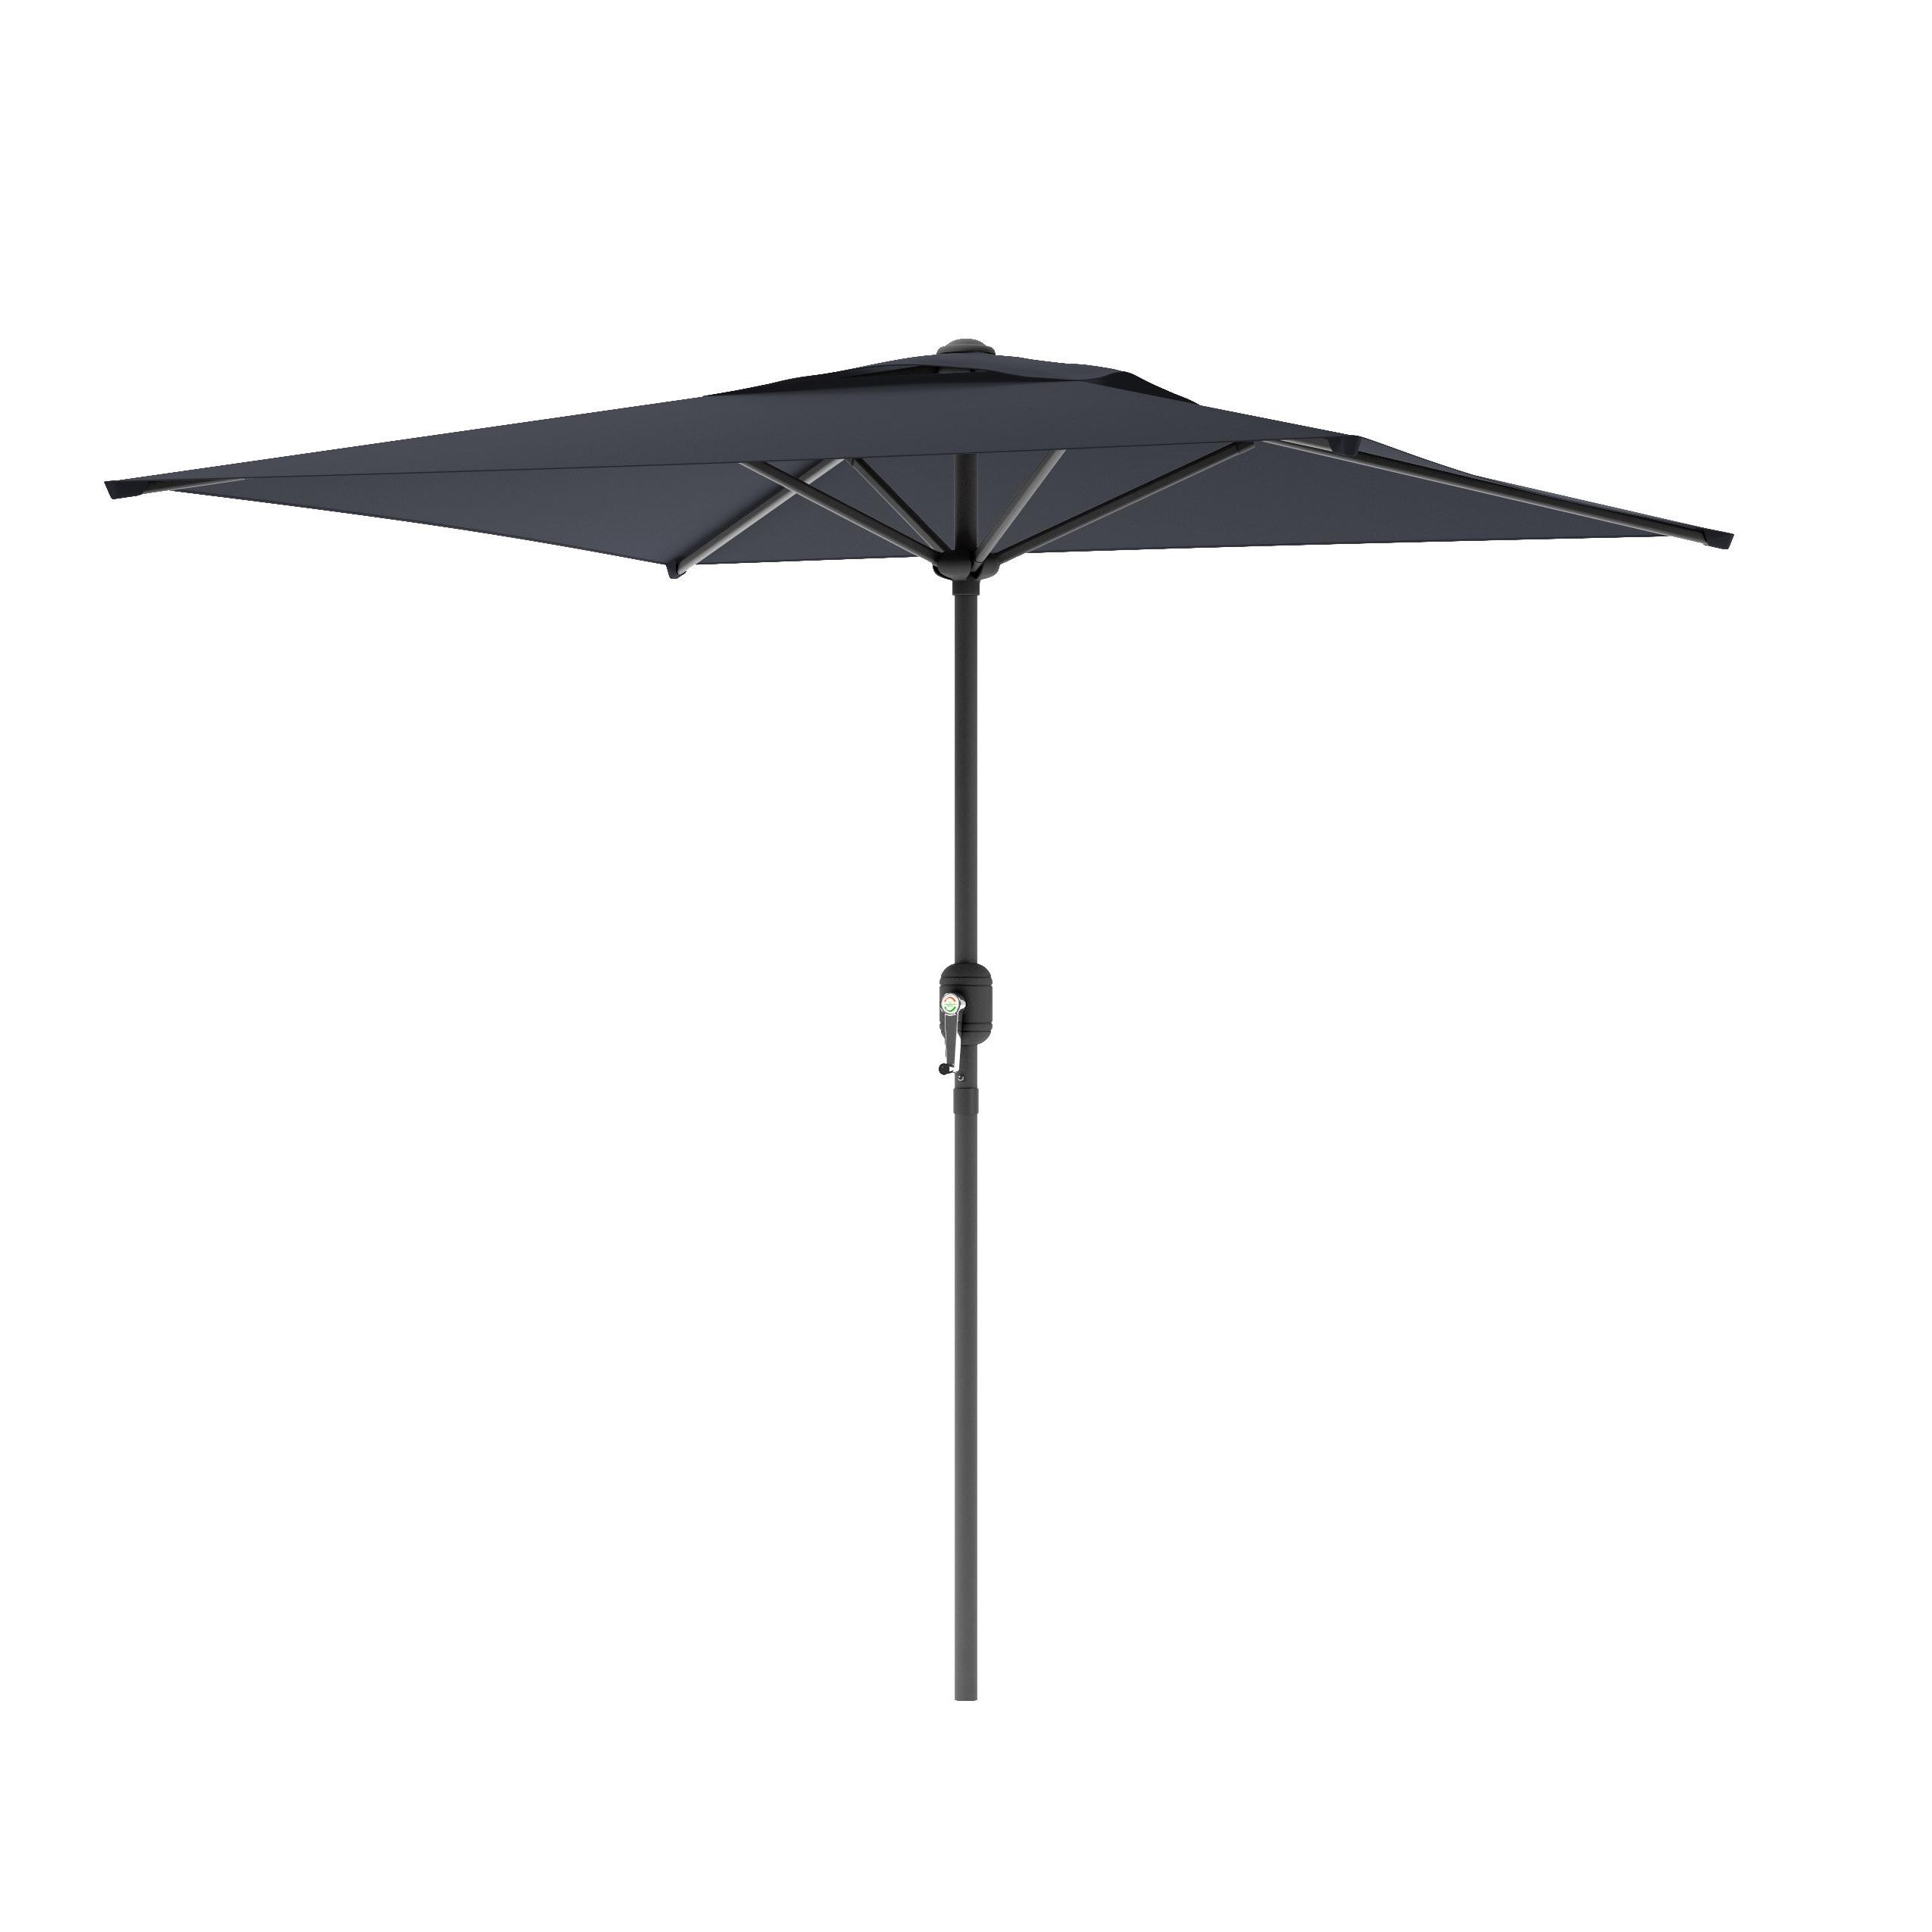 Fashionable Bradford Patio Market Umbrellas With Crowborough 9' Square Market Umbrella (View 12 of 20)